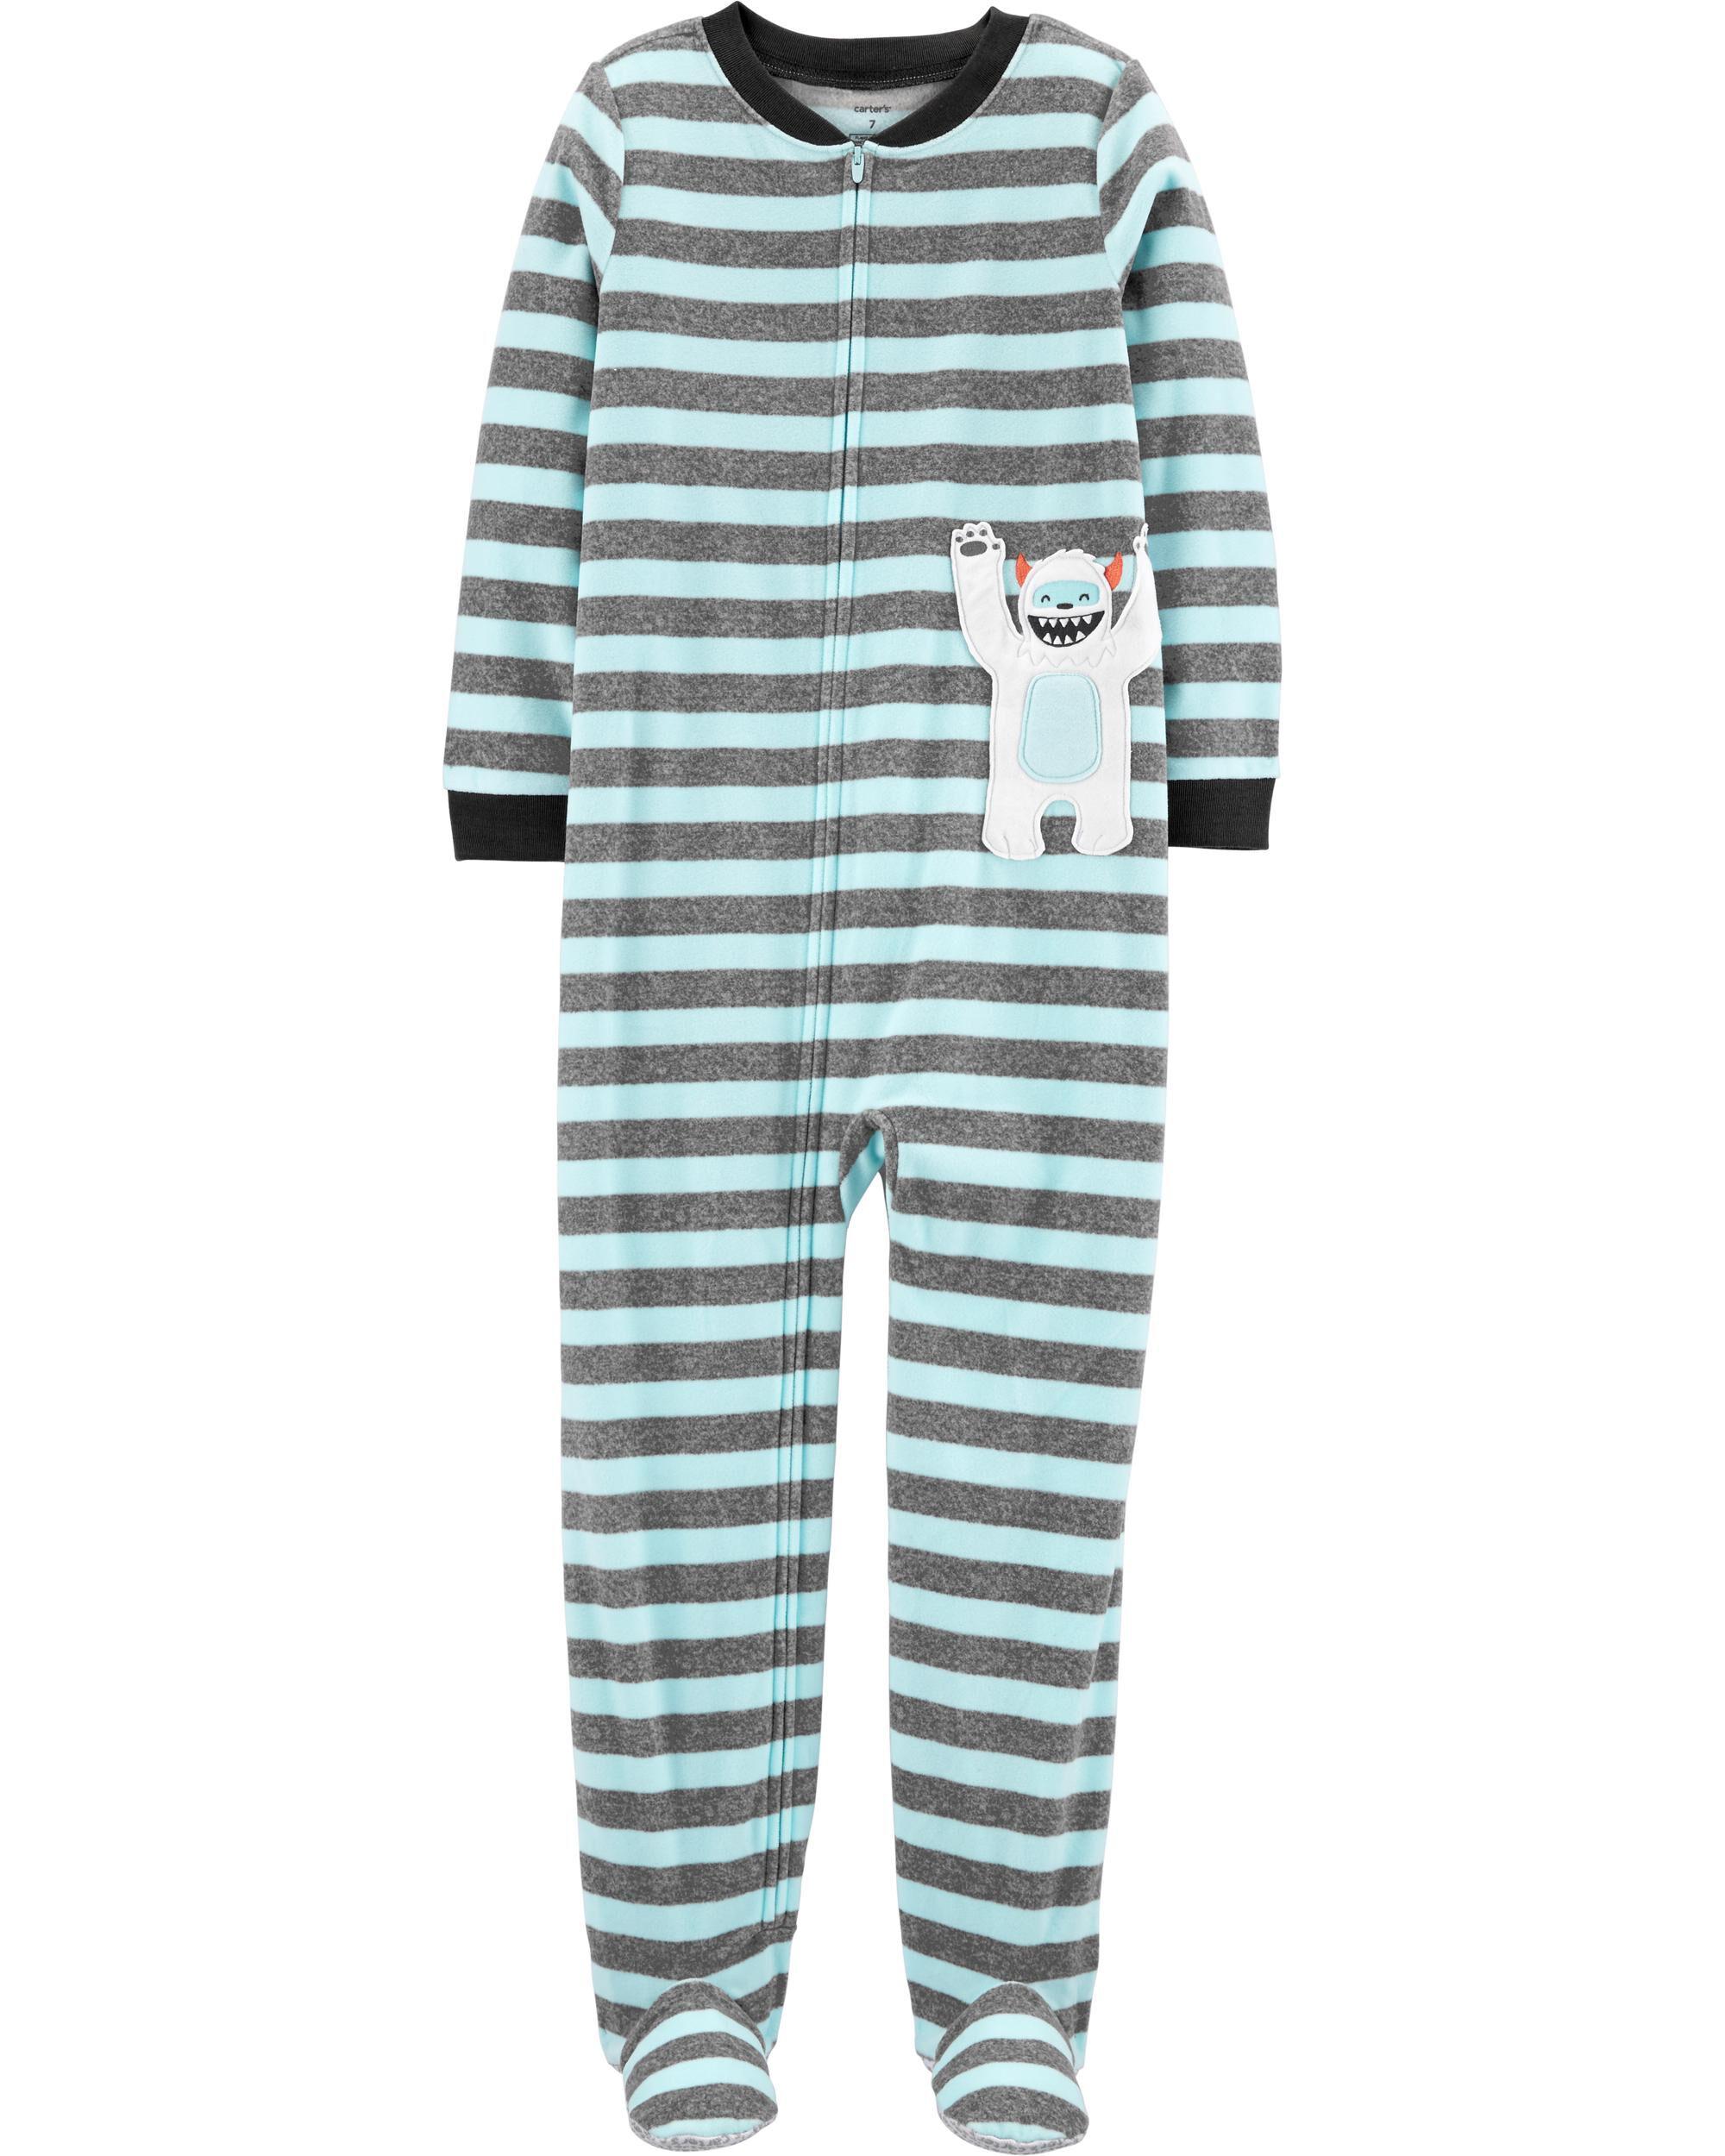 Carters Little Boys 1 Piece Abominable Snowman Fleece Size 4T Turquoise